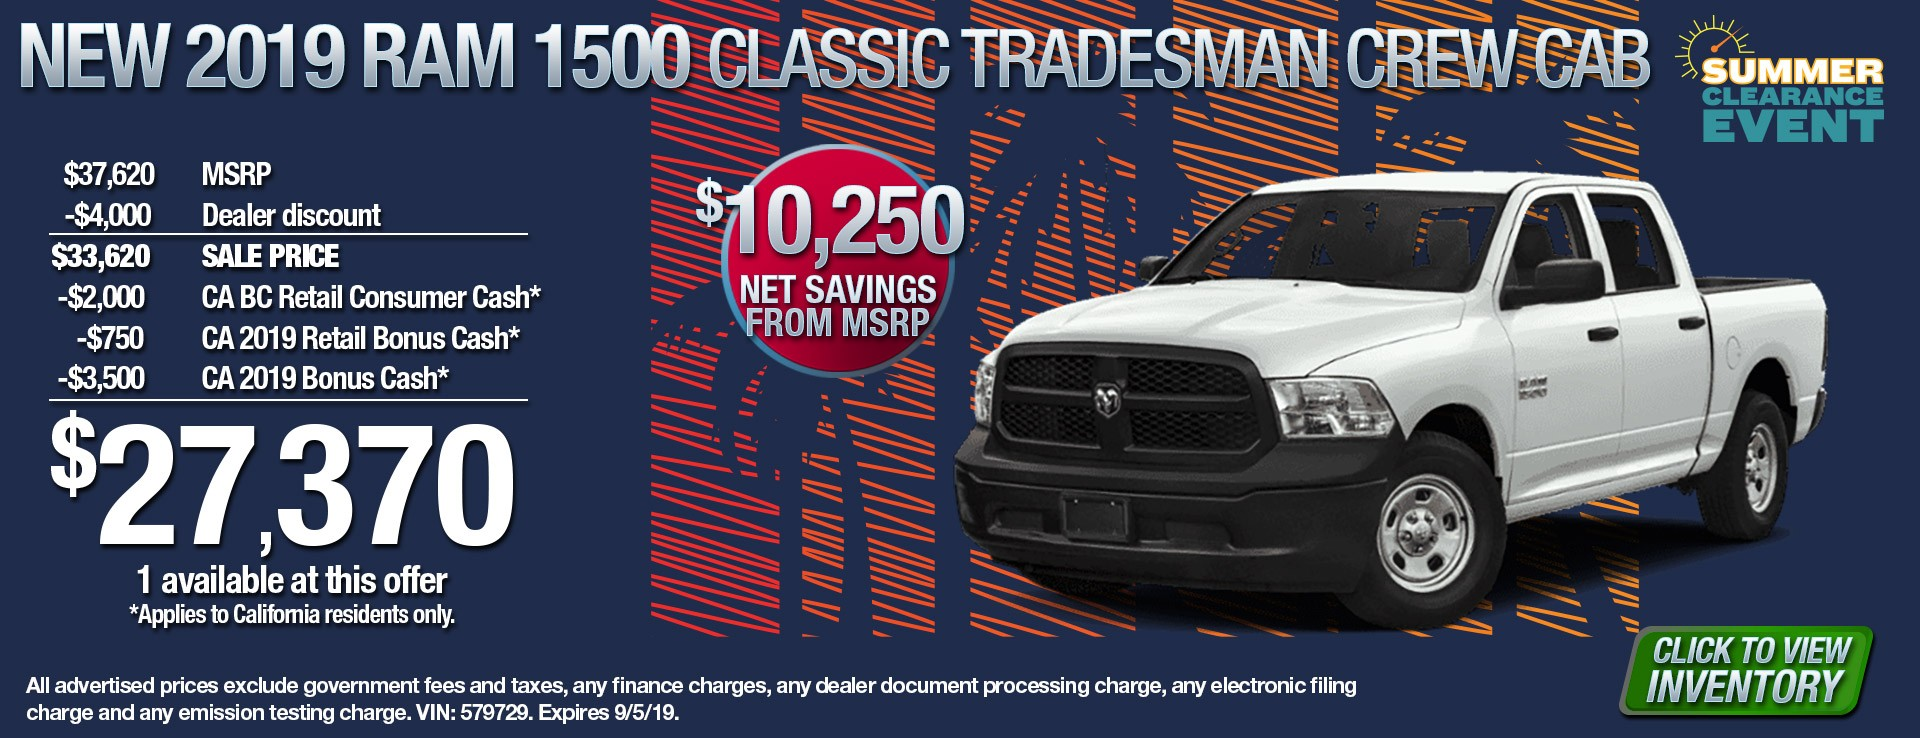 19 Ram 1500 Class Trade